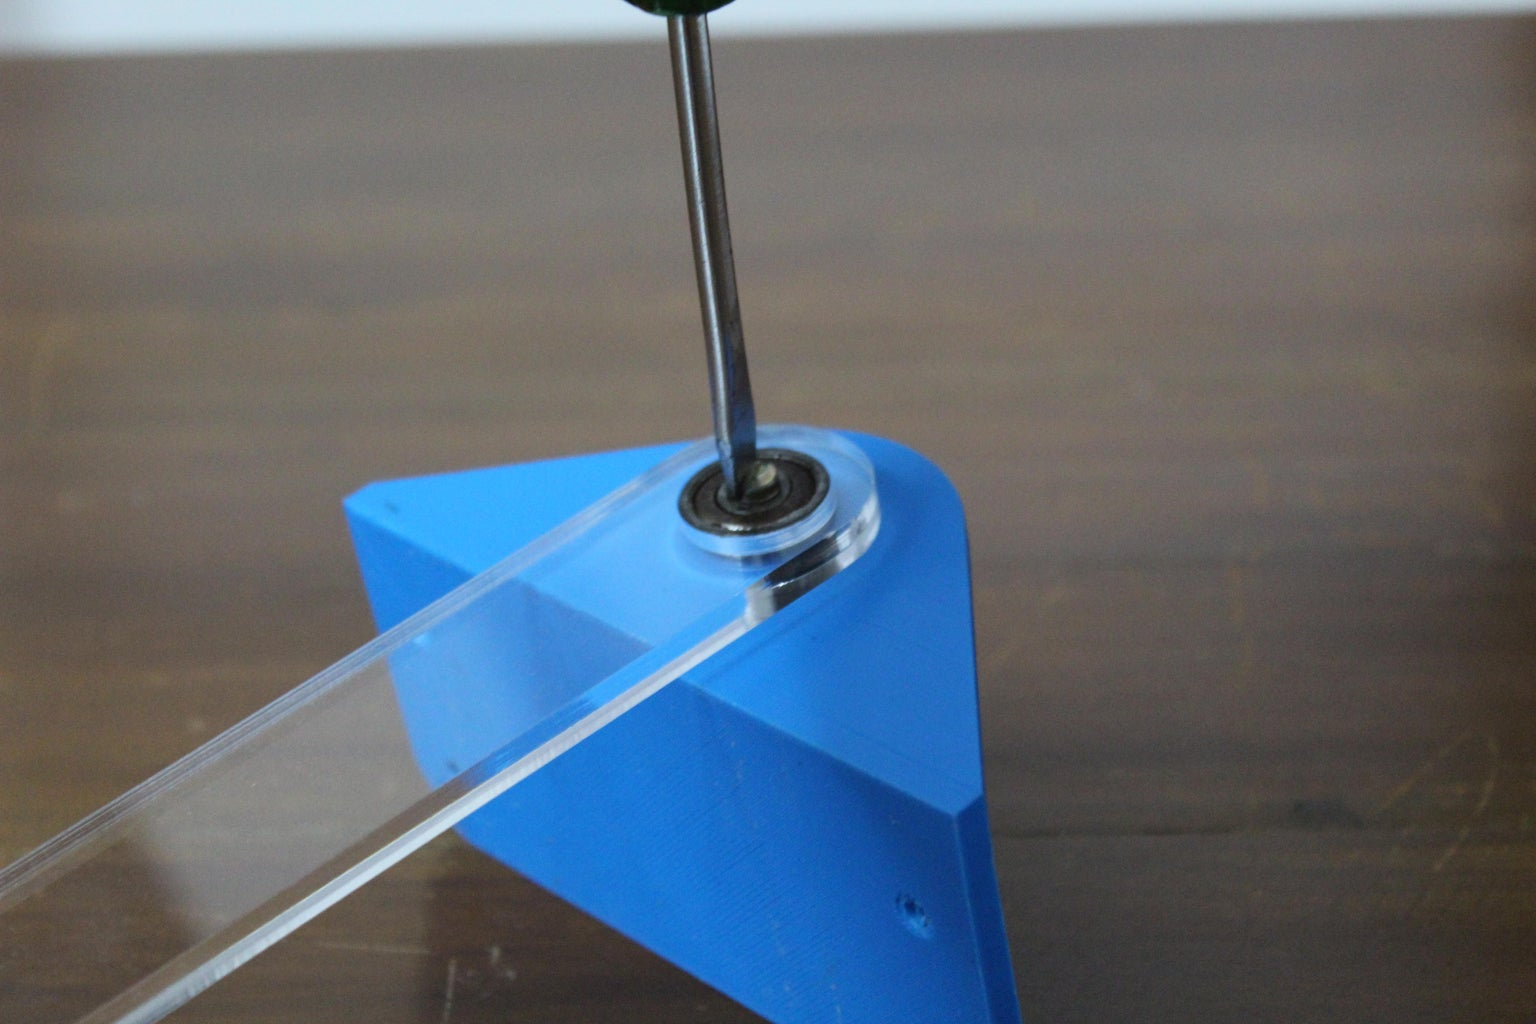 Mounting the Pendulum